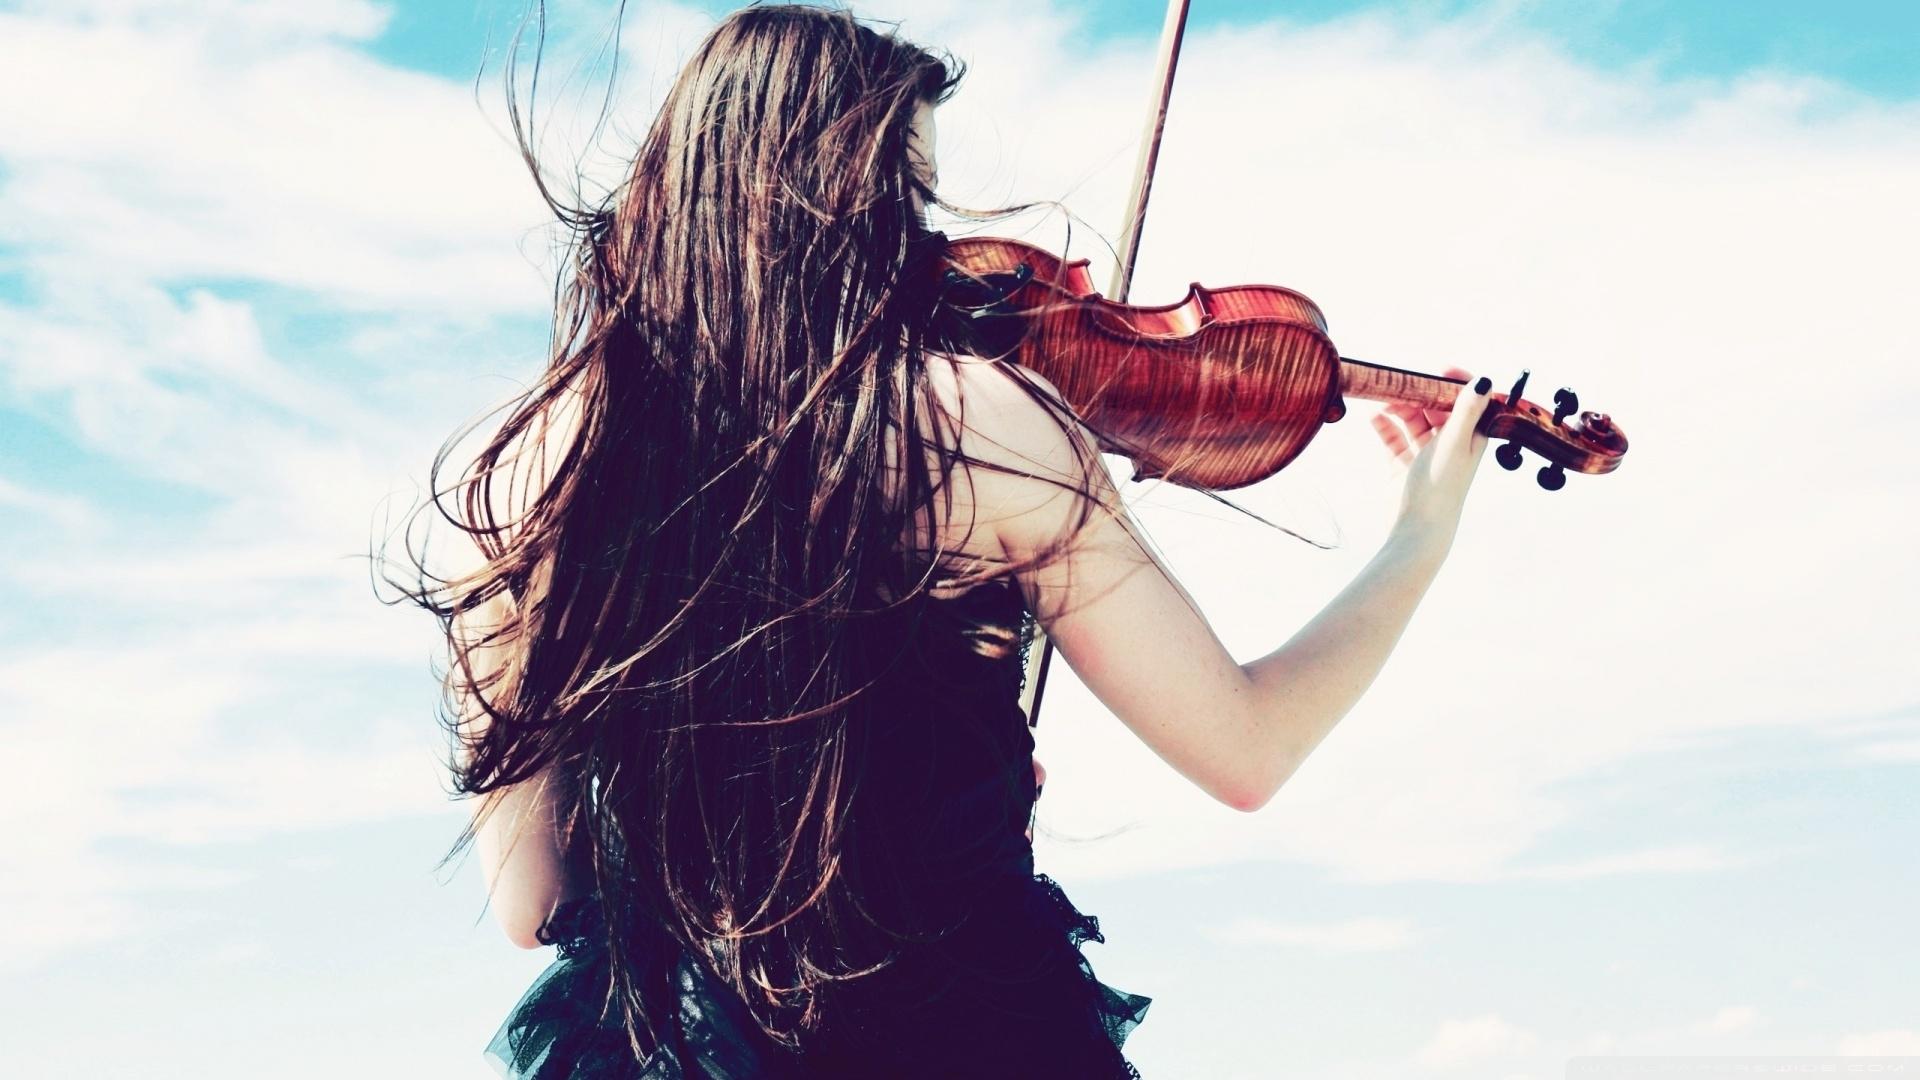 Violinist Wallpaper